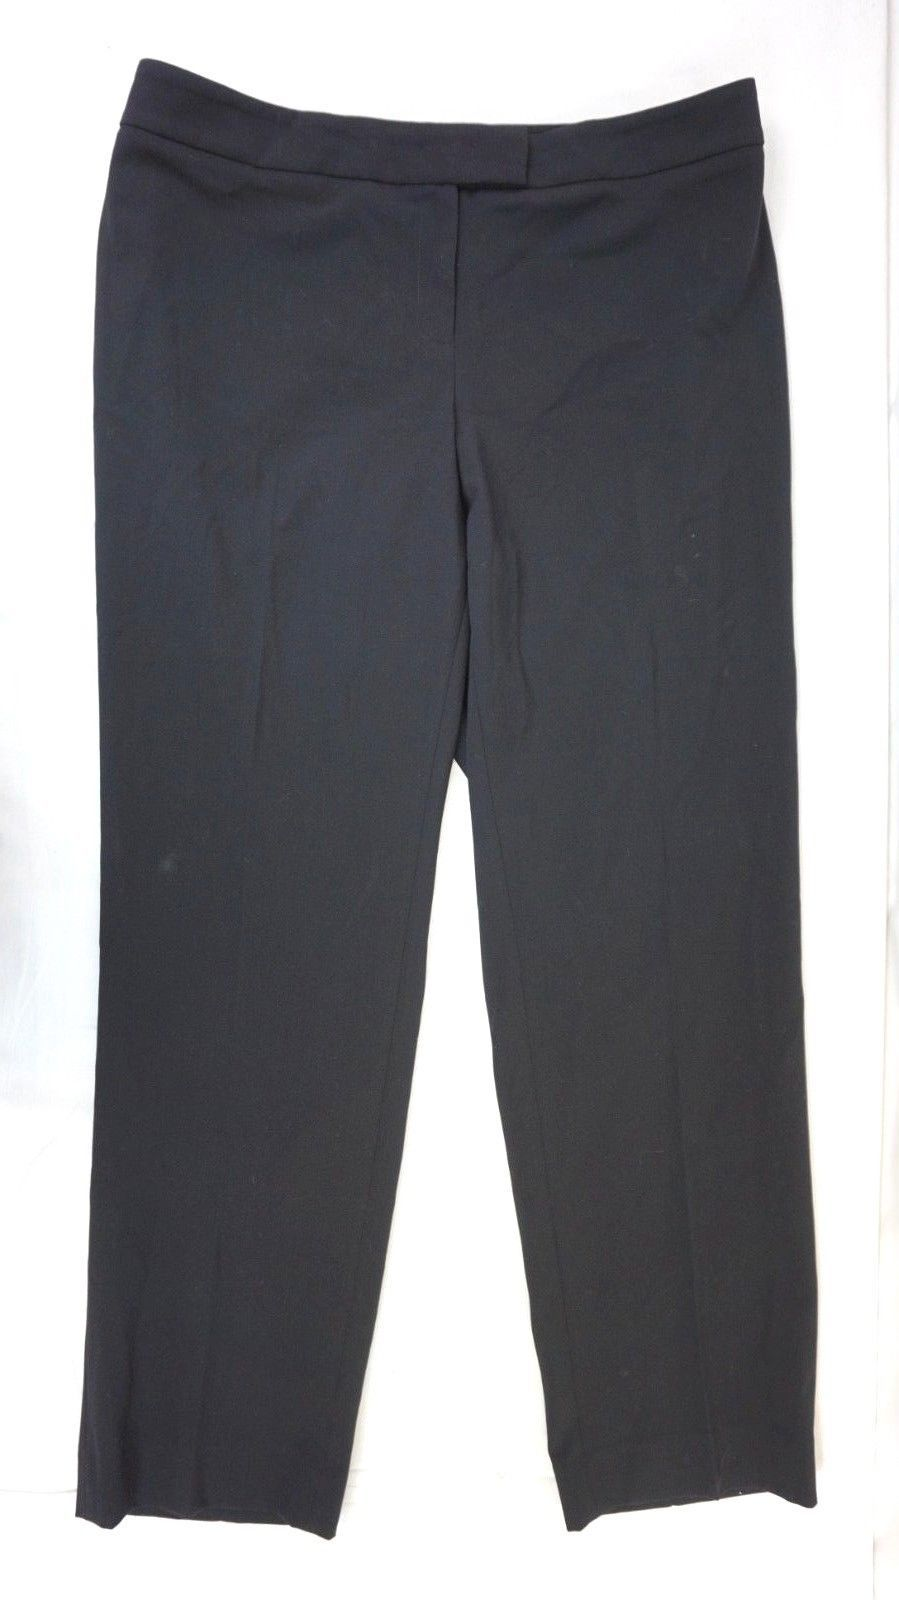 NWT ANNE KLEIN Women's Black Stretch No Pocket Dress Pants Plus Size 14W x 30